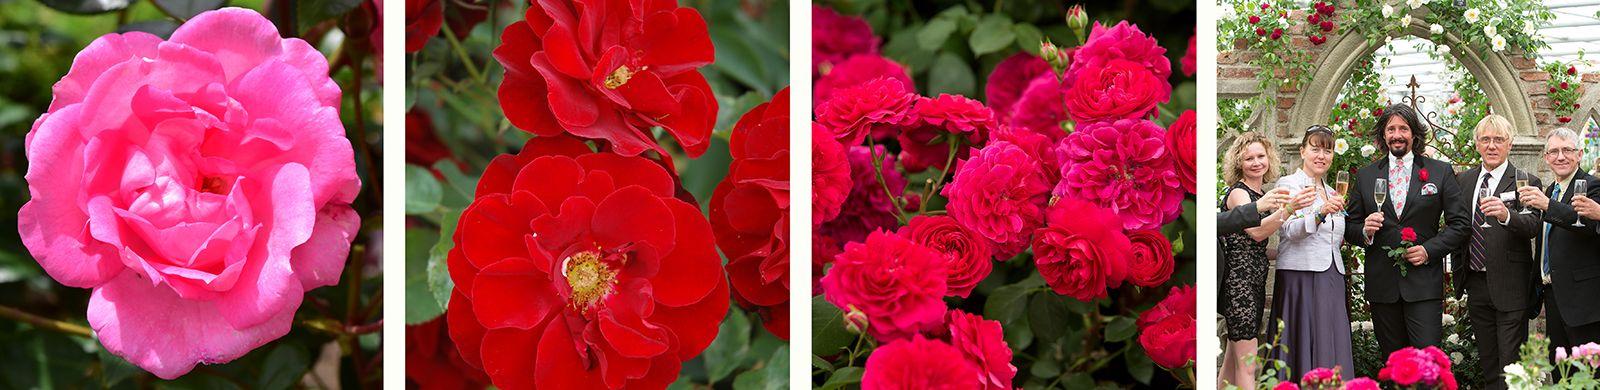 centenaire-de-lourdes-ruby-celebration-frilly-cuff